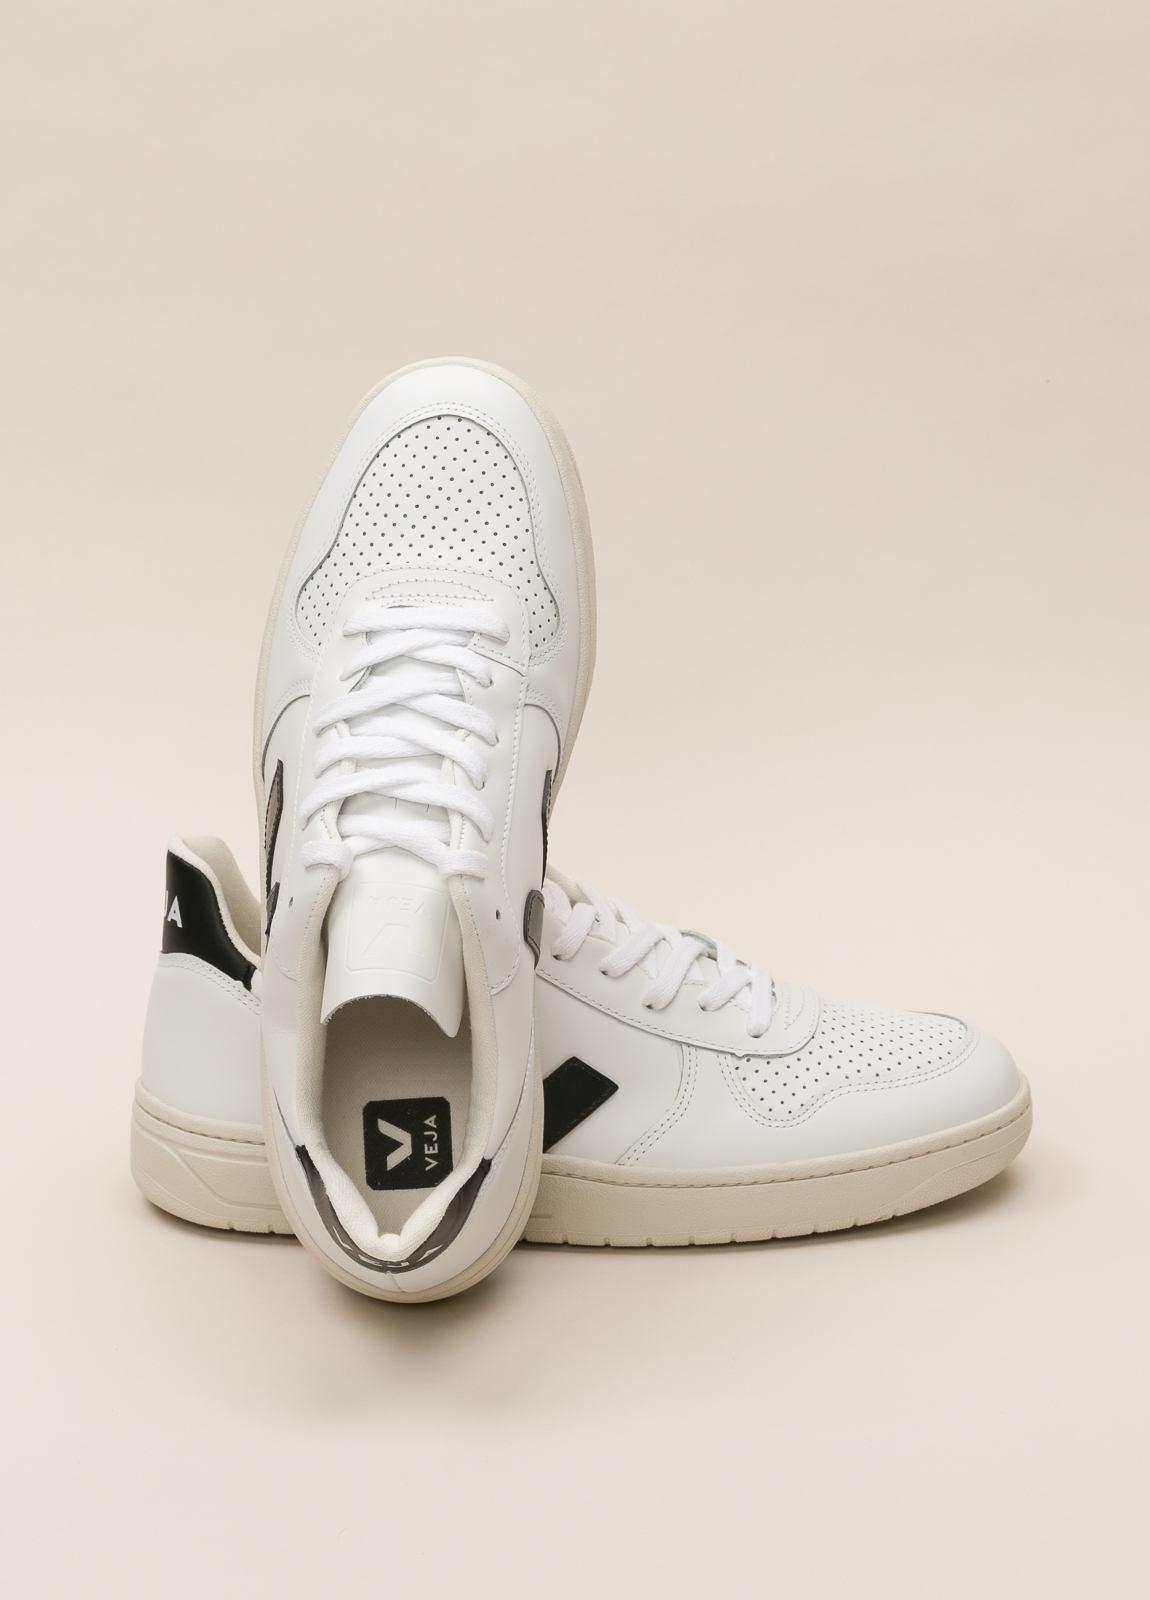 Zapatillas casual VEJA blanco - Ítem1